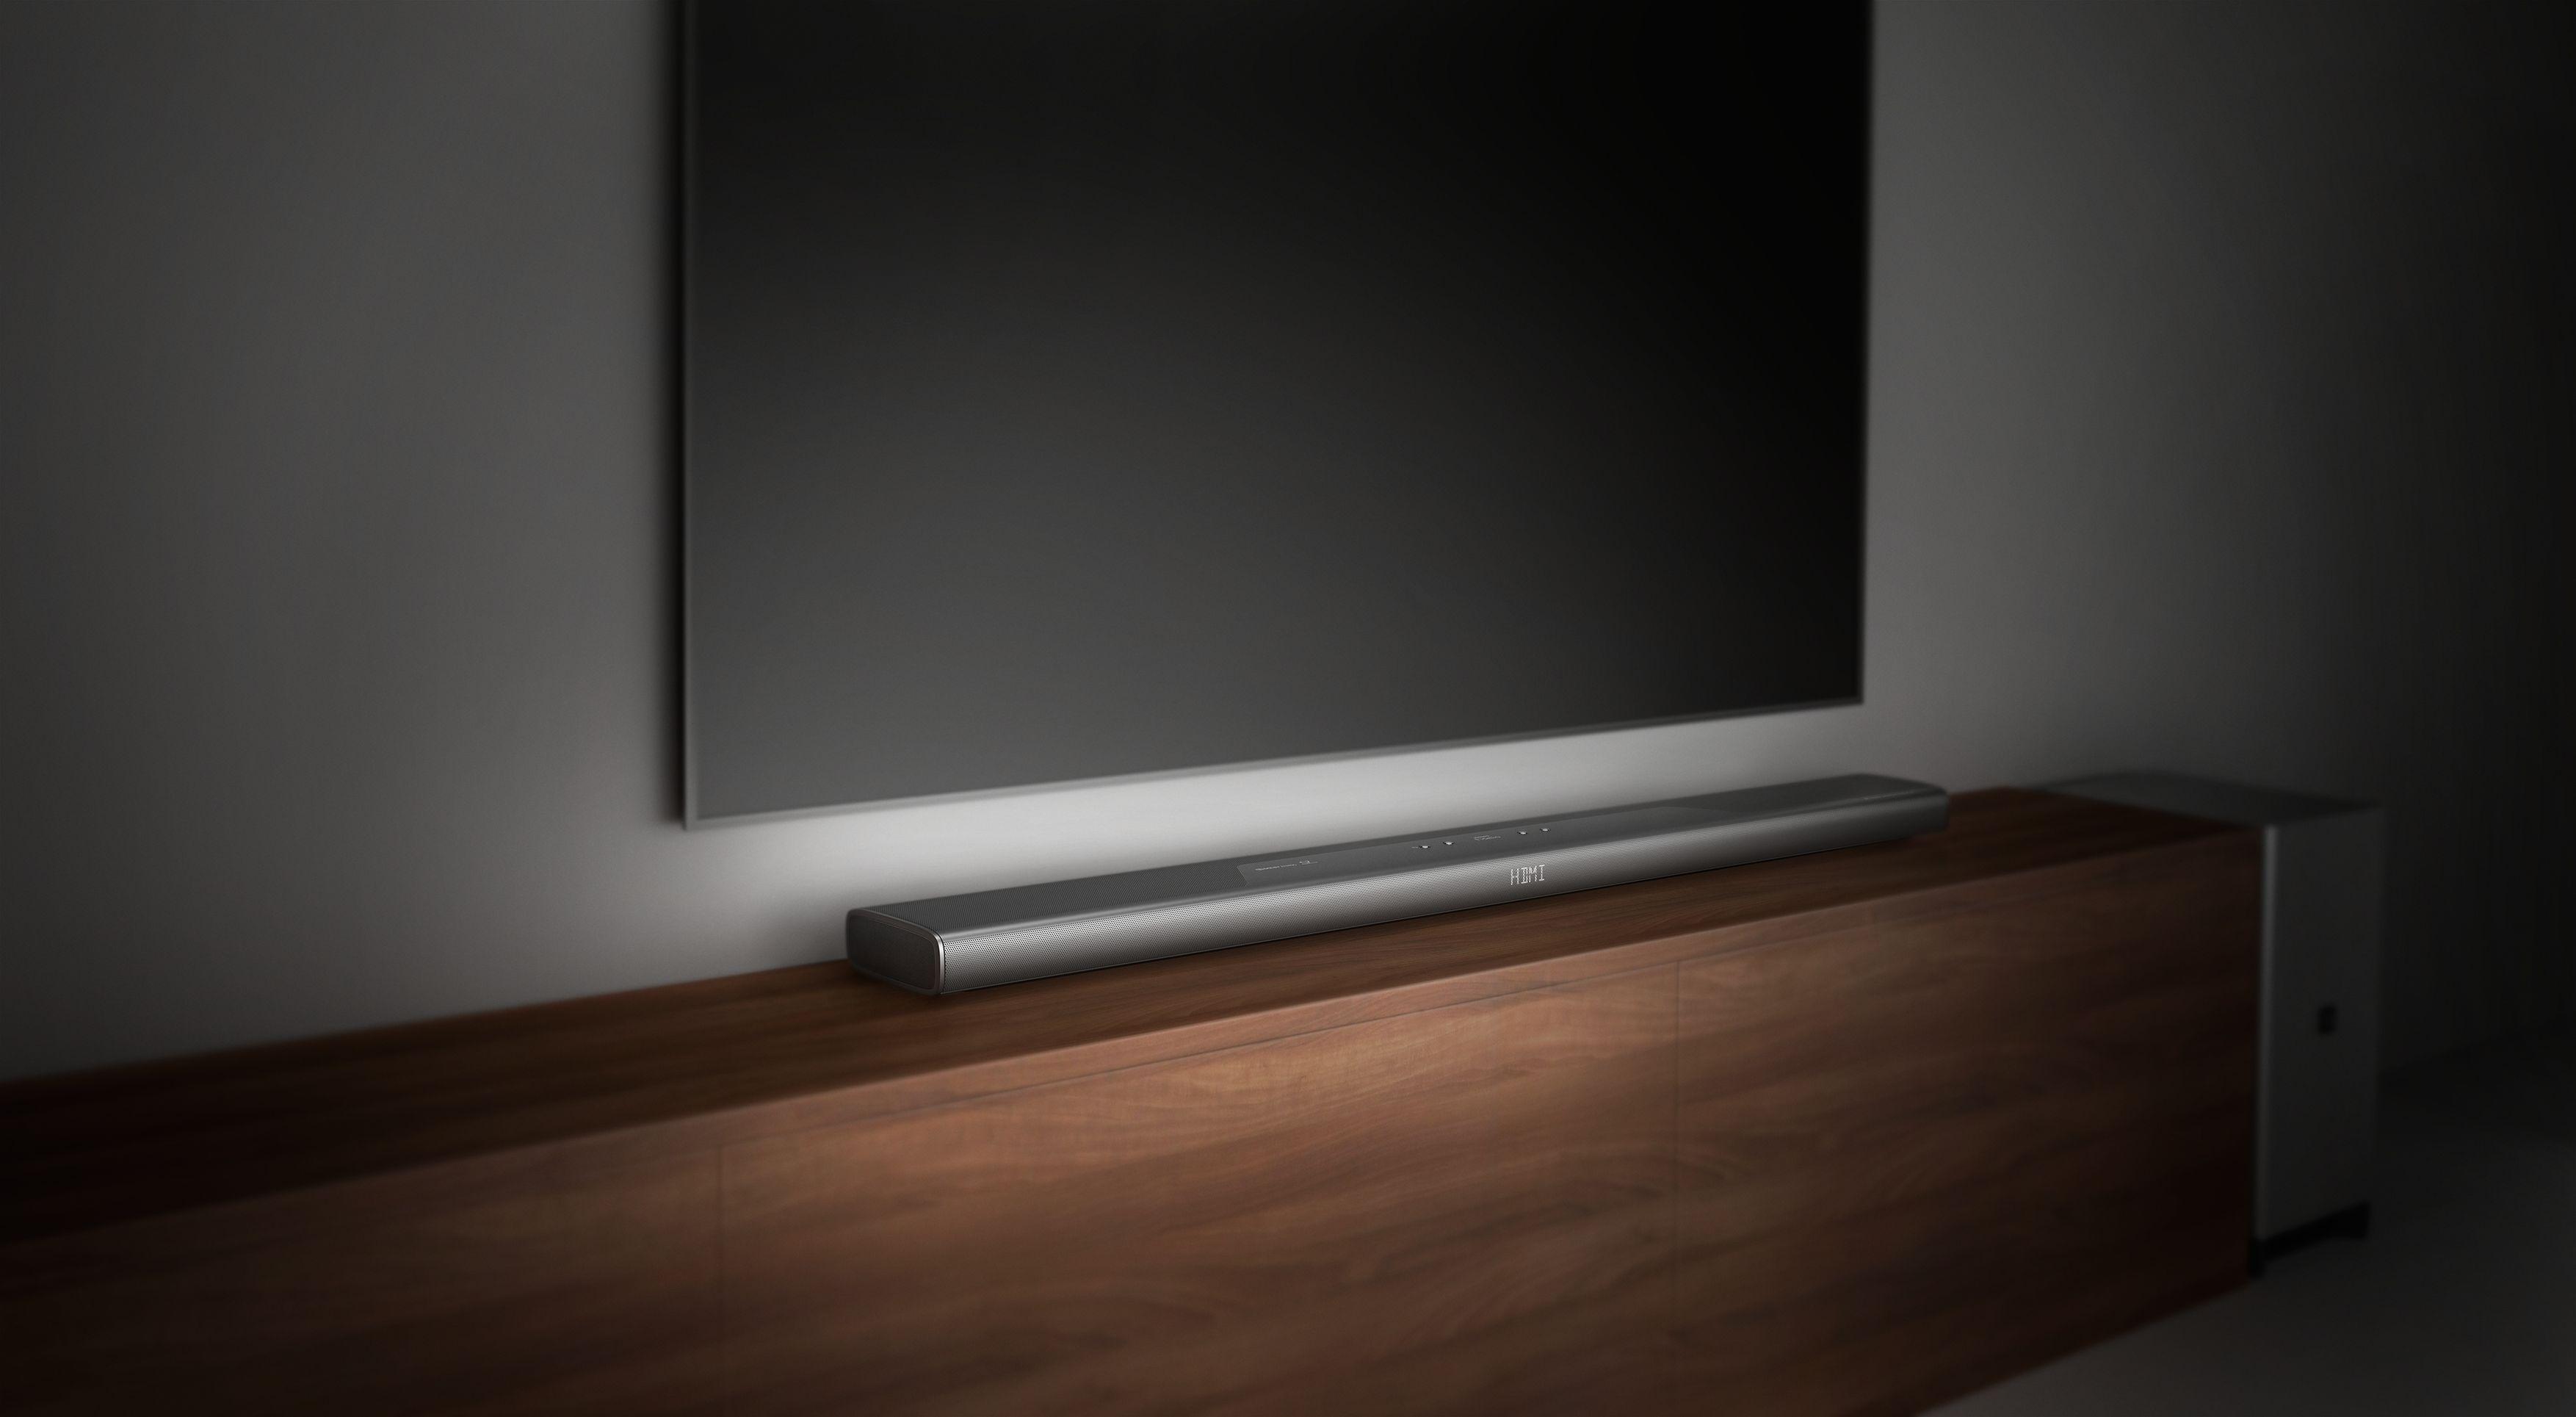 Philips Fidelio B8 Soundbar